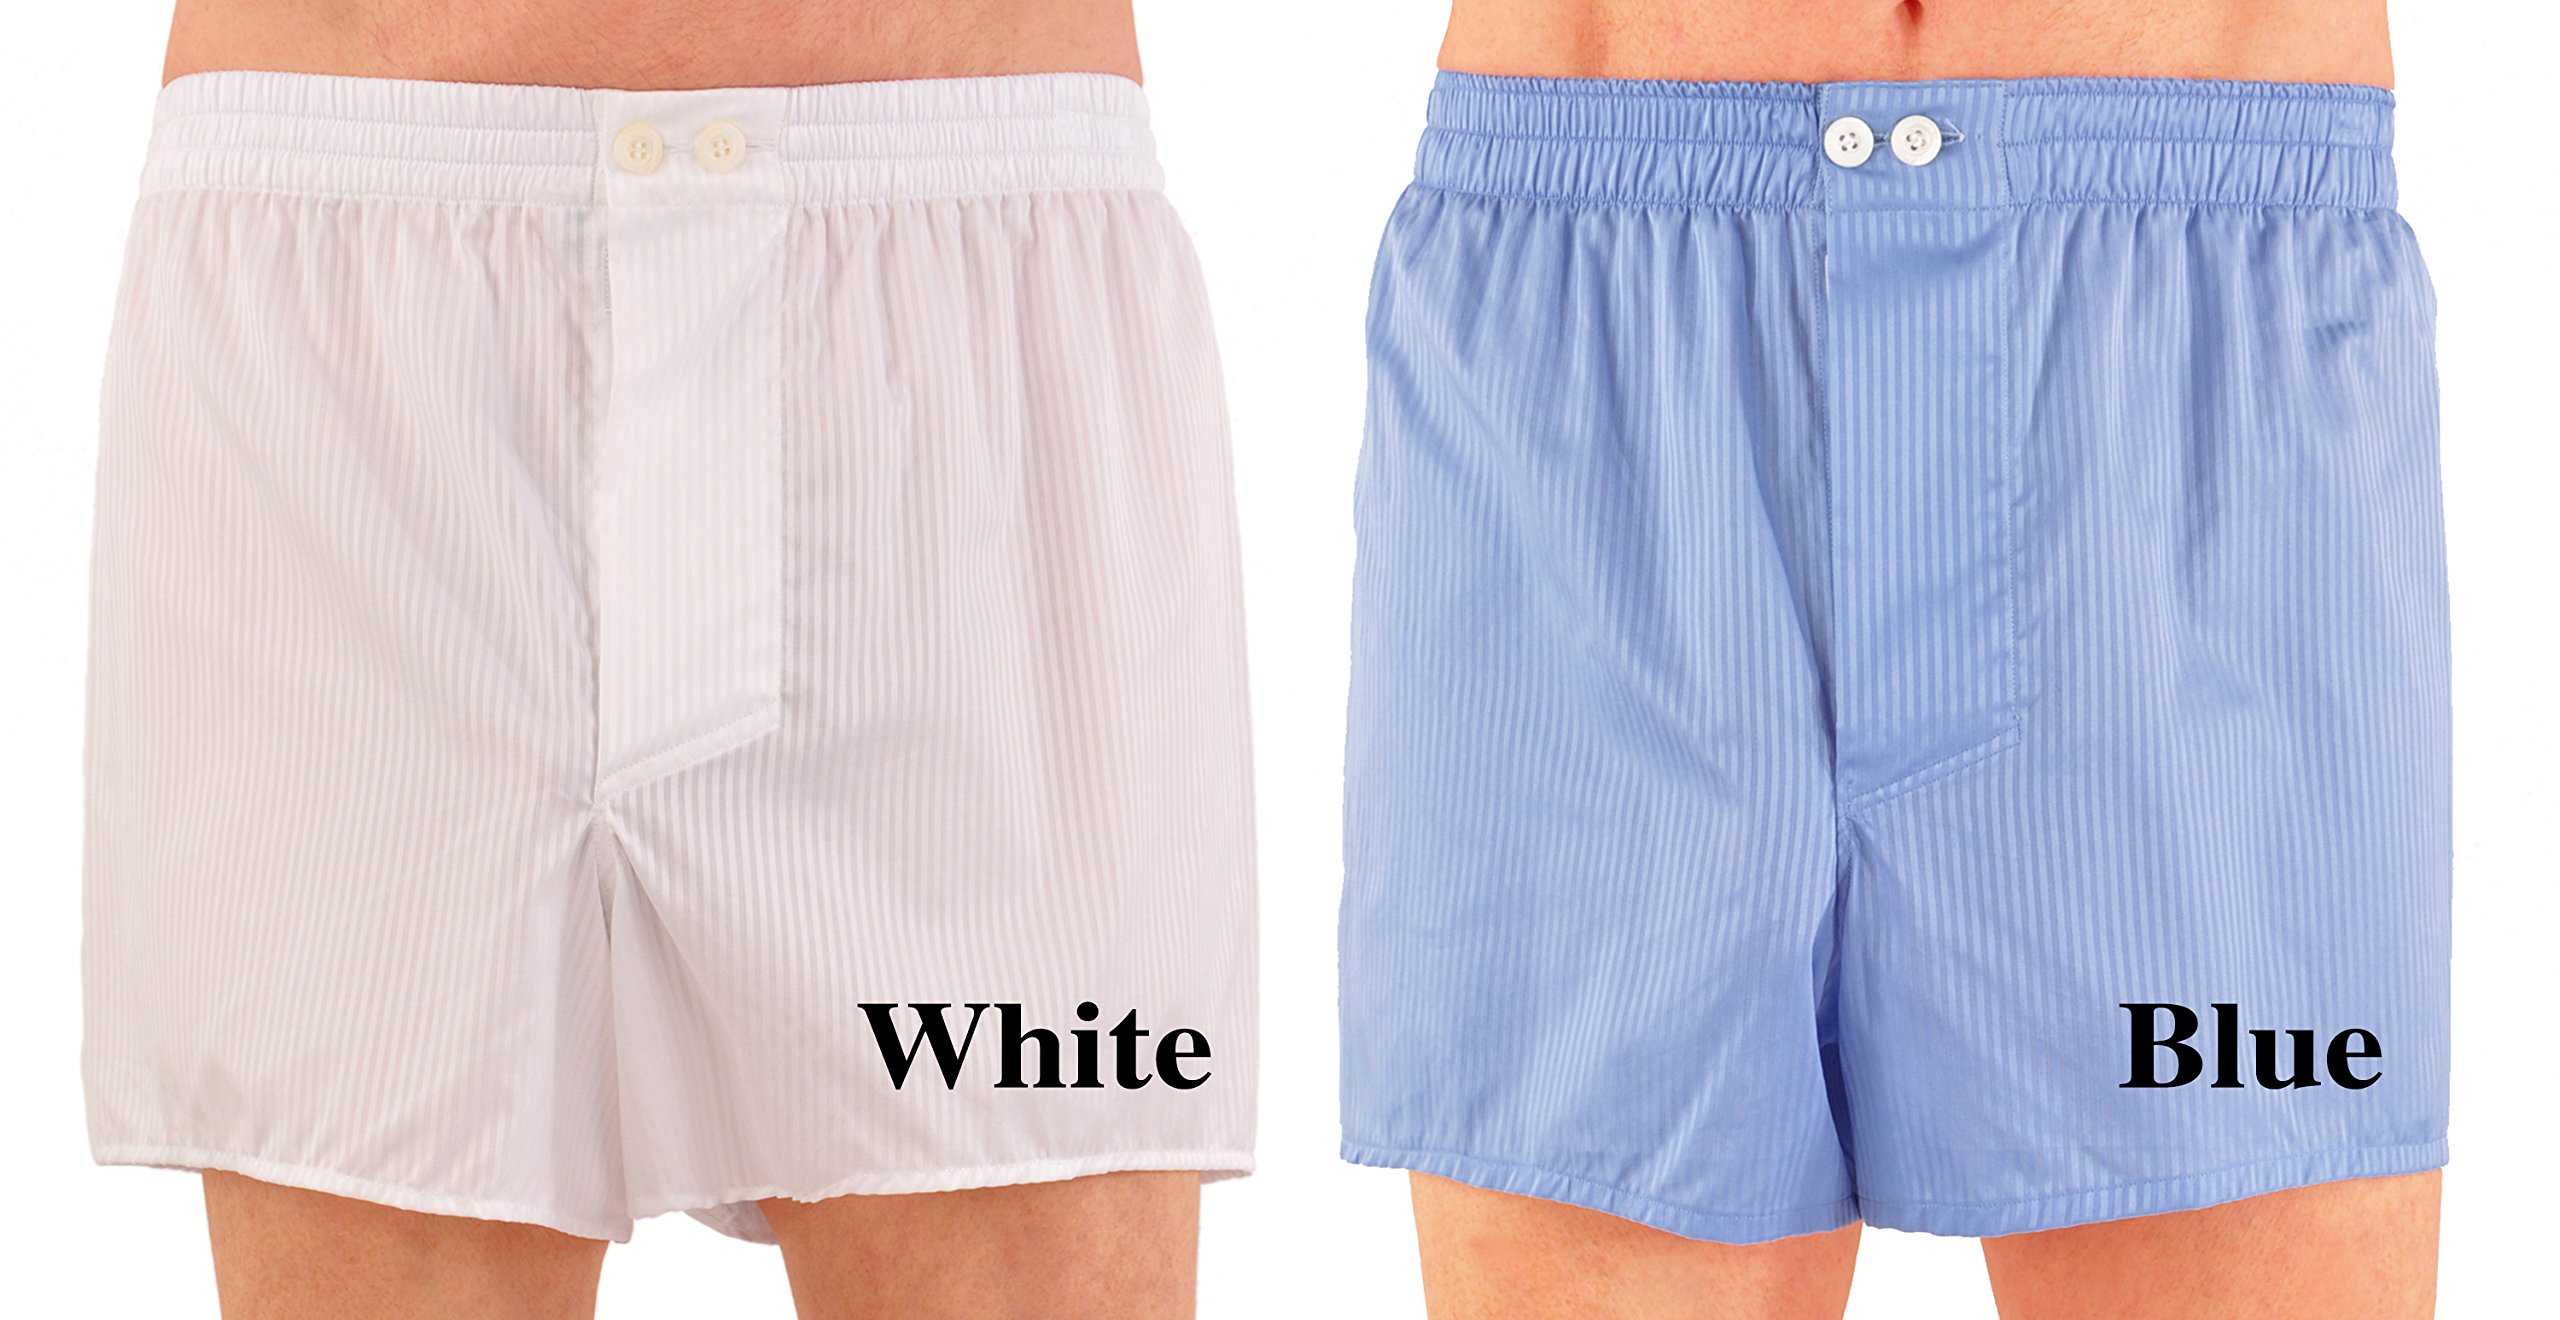 World's Finest Woven Boxer Shorts - 3 Pairs Medium/Blue by Kabbaz-Kelly (Image #2)